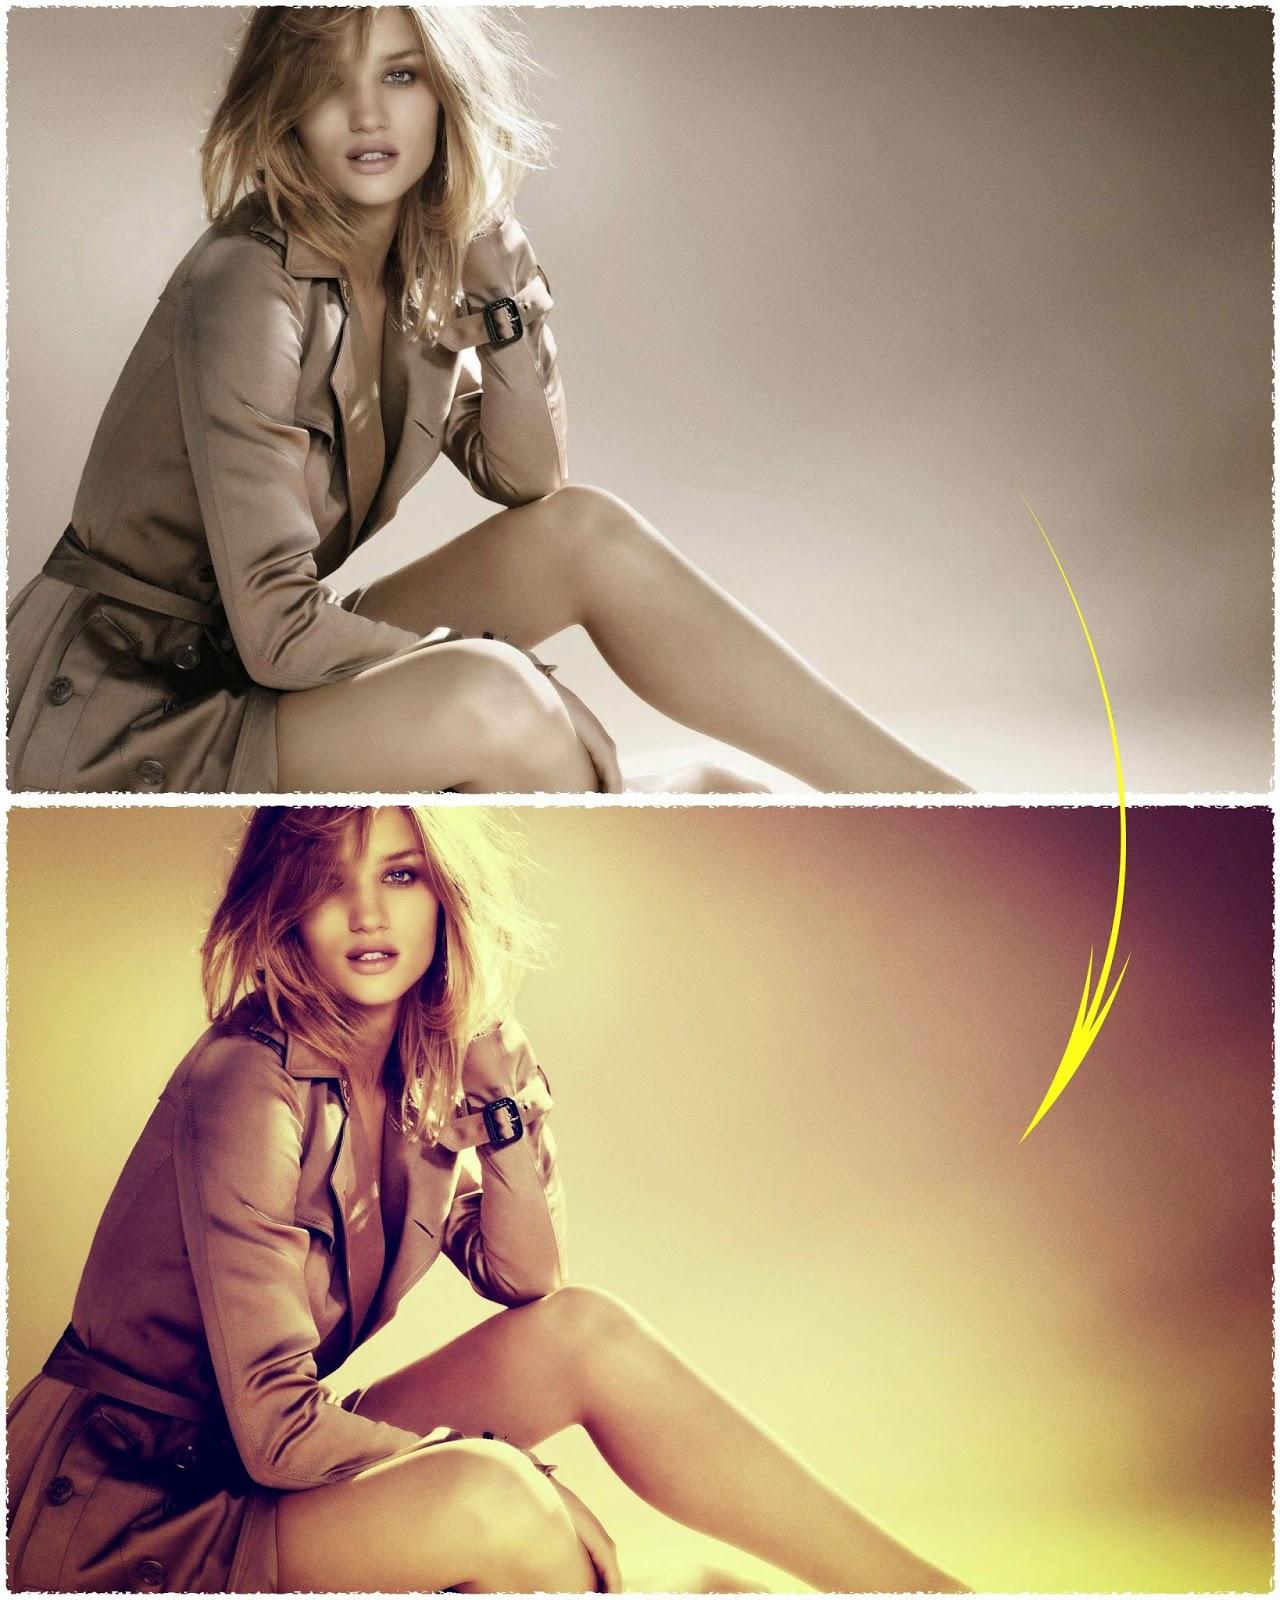 Tutorial Membuat Efek Vintage Dengan Photoshop